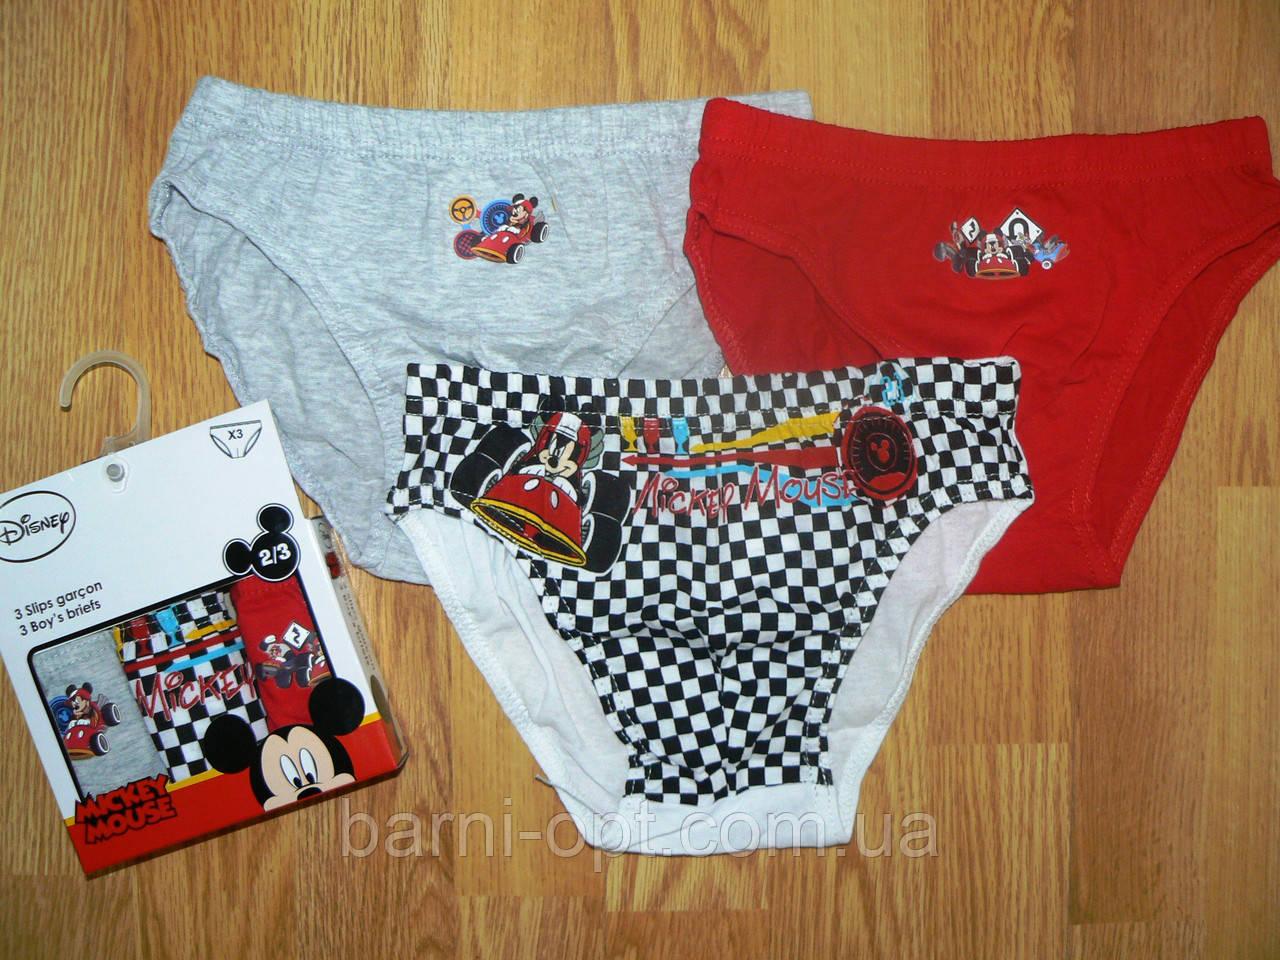 Трусики на мальчиков  Mickey Mouse, Disney,в наличии 2/3 рр